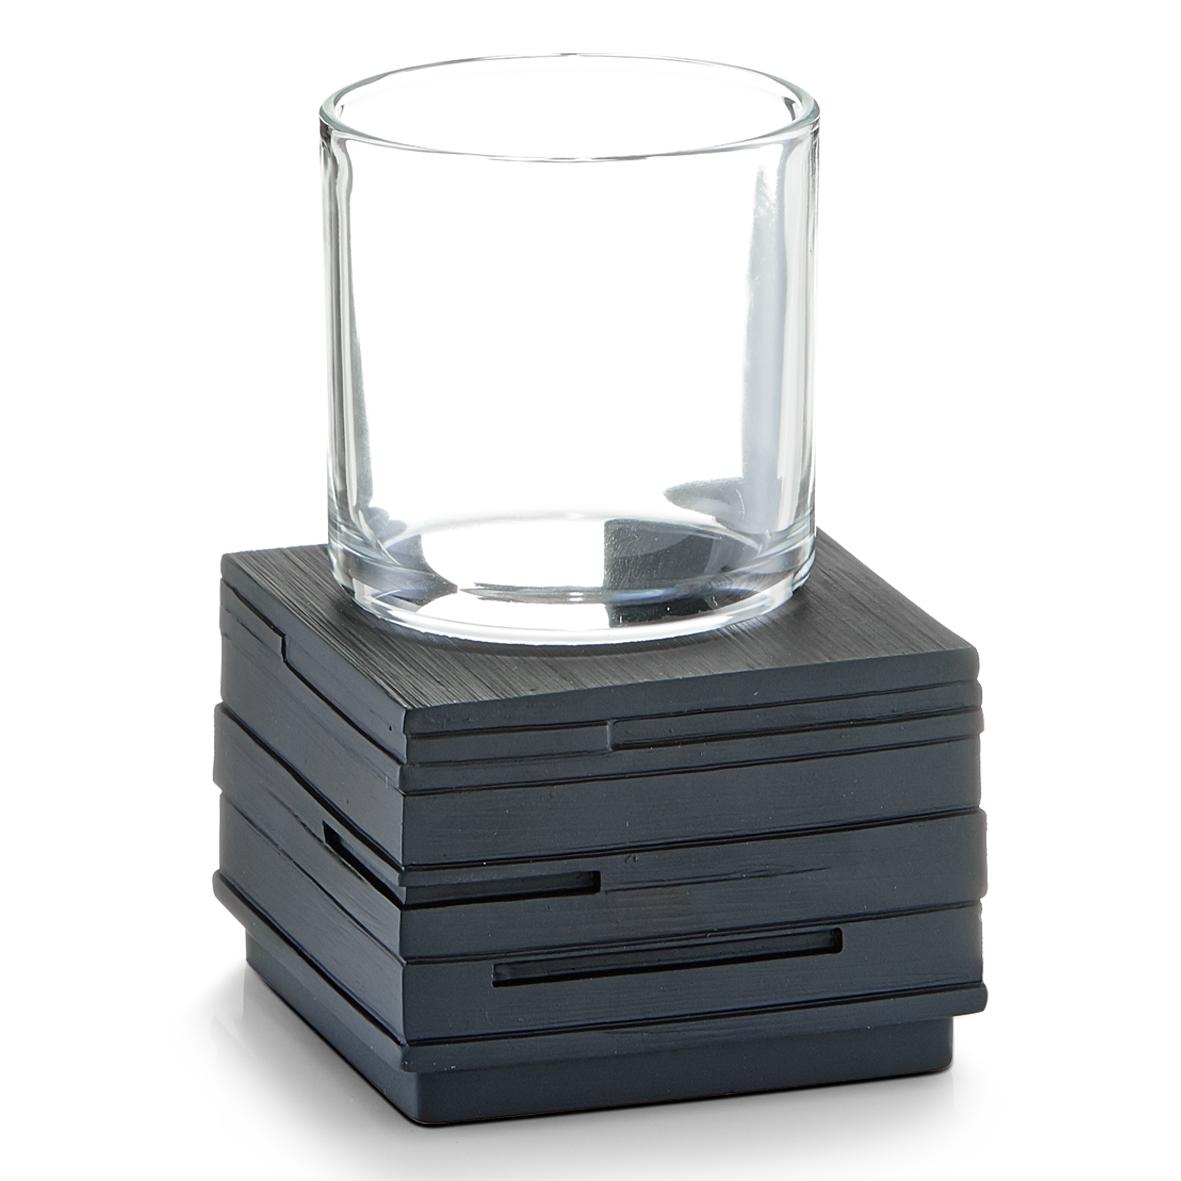 Pahar pentru periuta din polirasina, Slate Black, l8,3xA8,3xH11,5 cm imagine